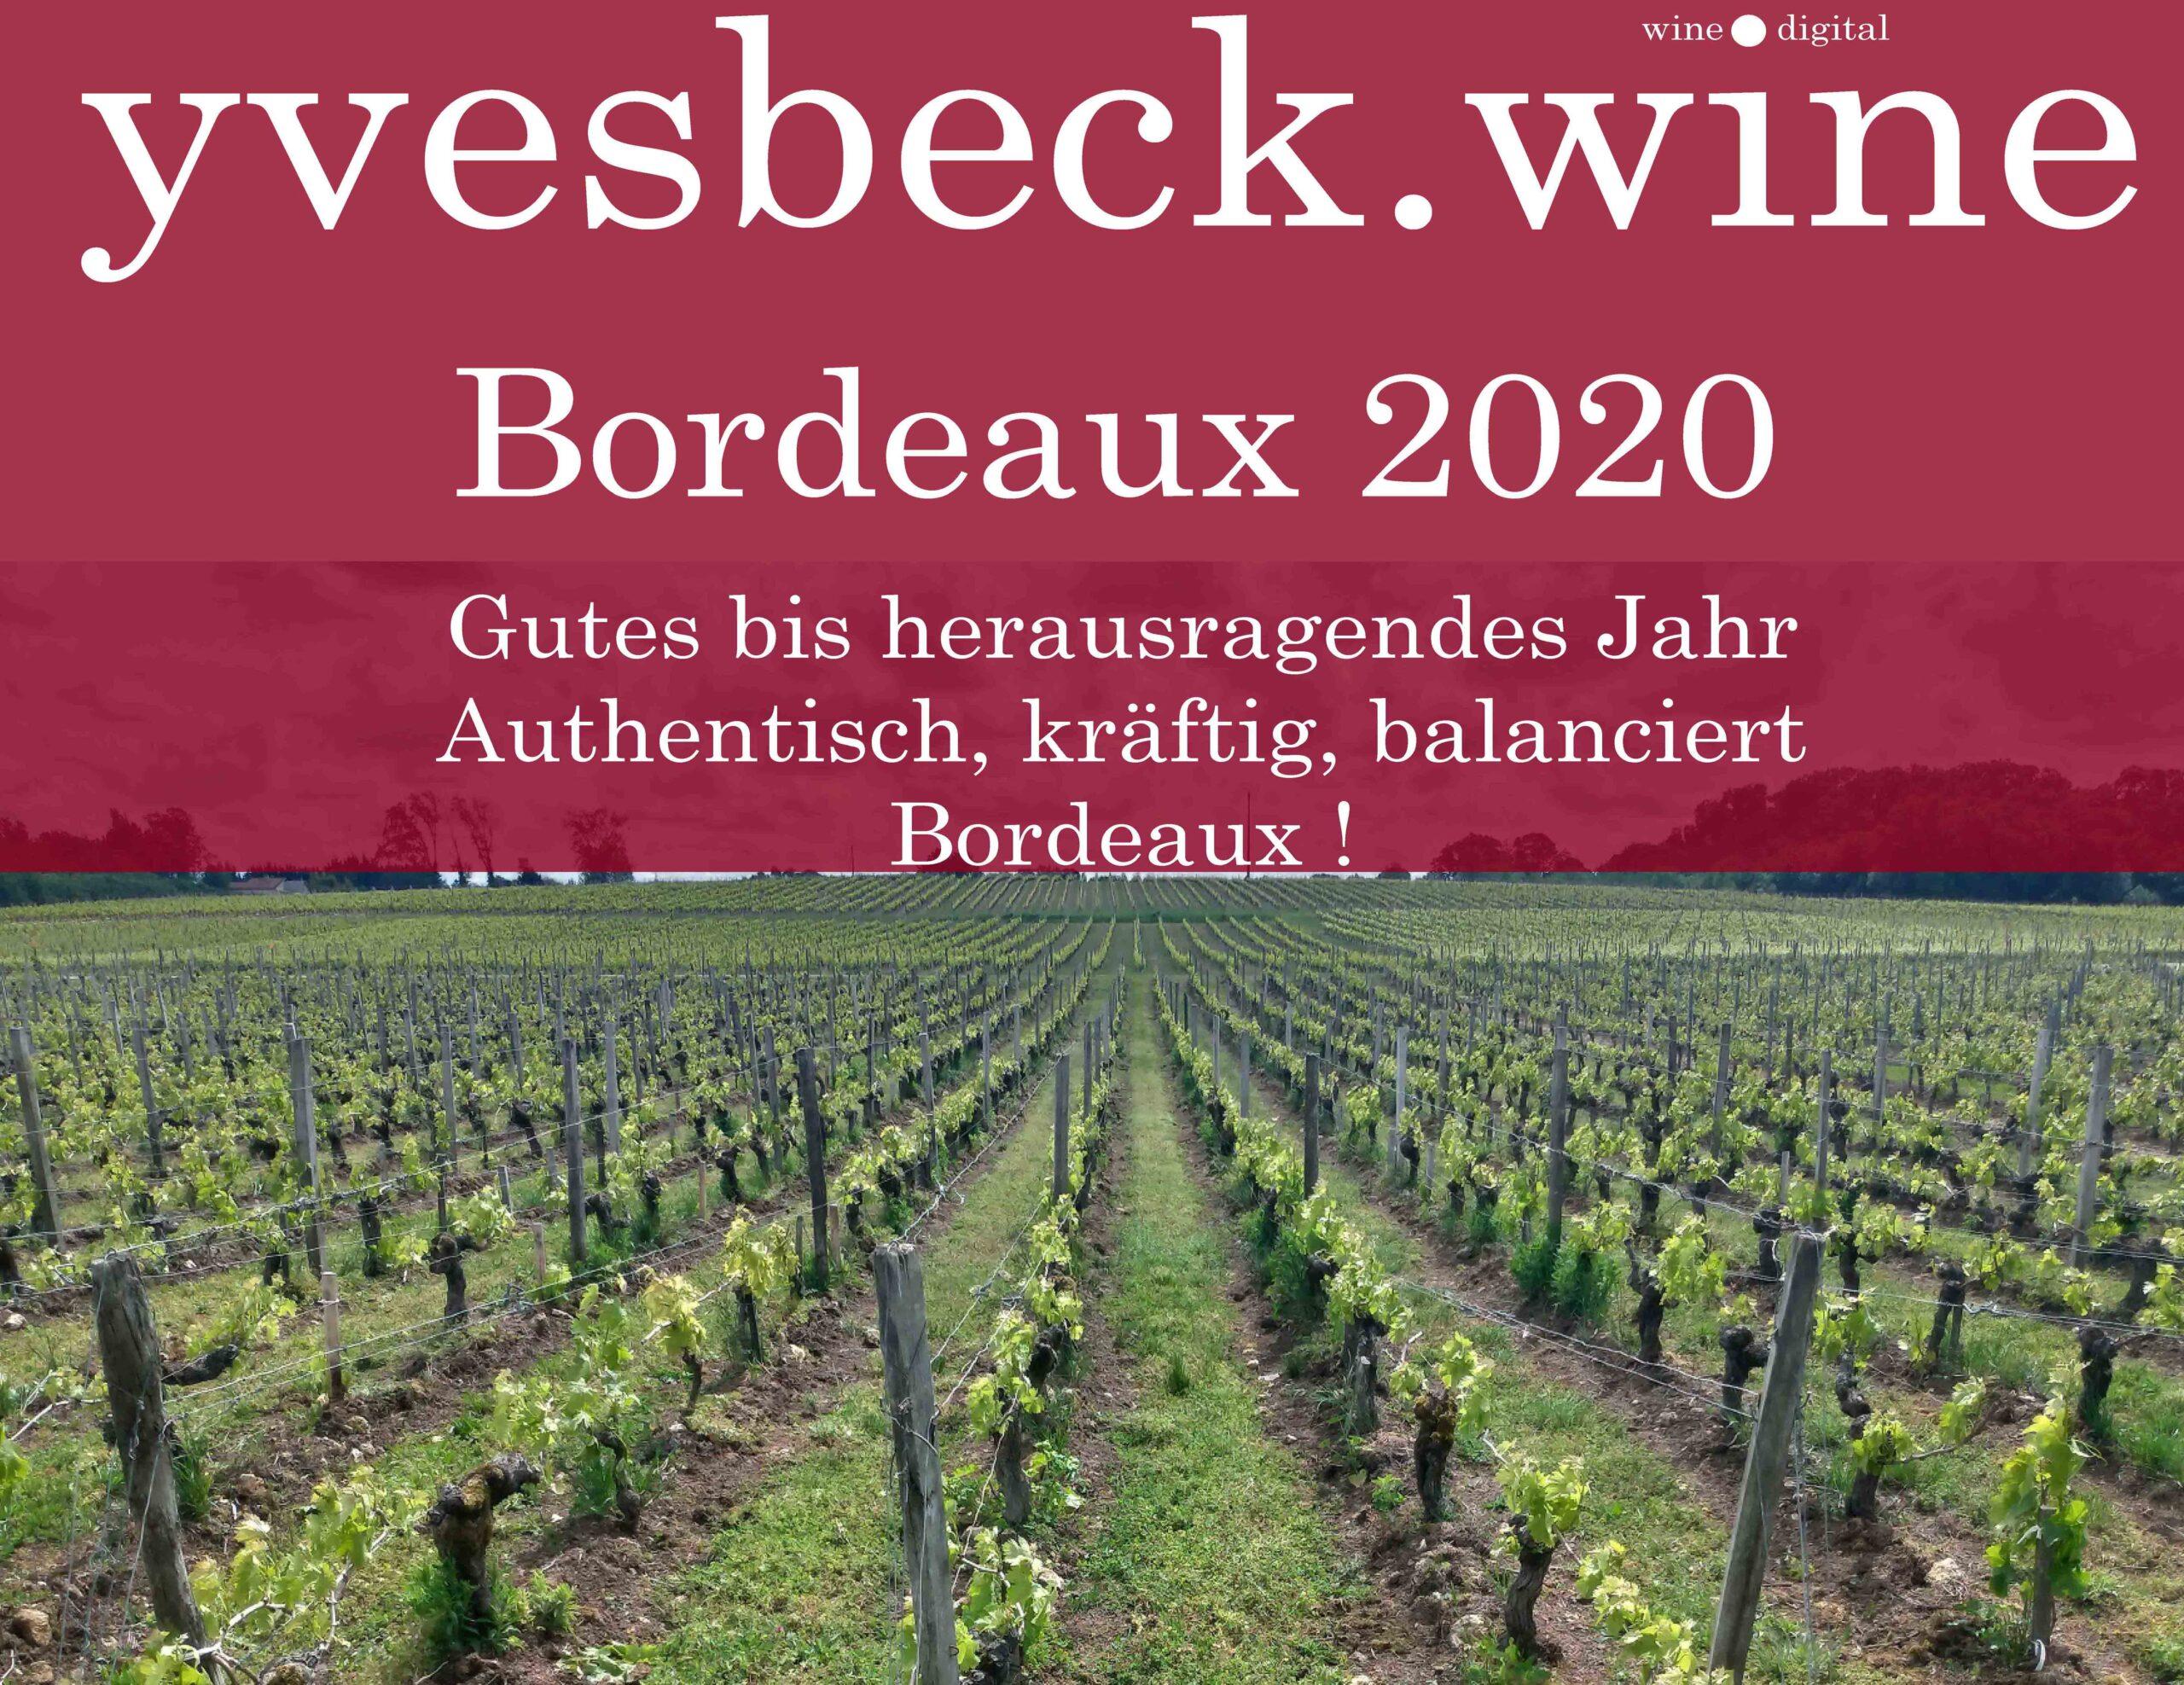 Primeurs Bordeaux 2020 - Yves Beck